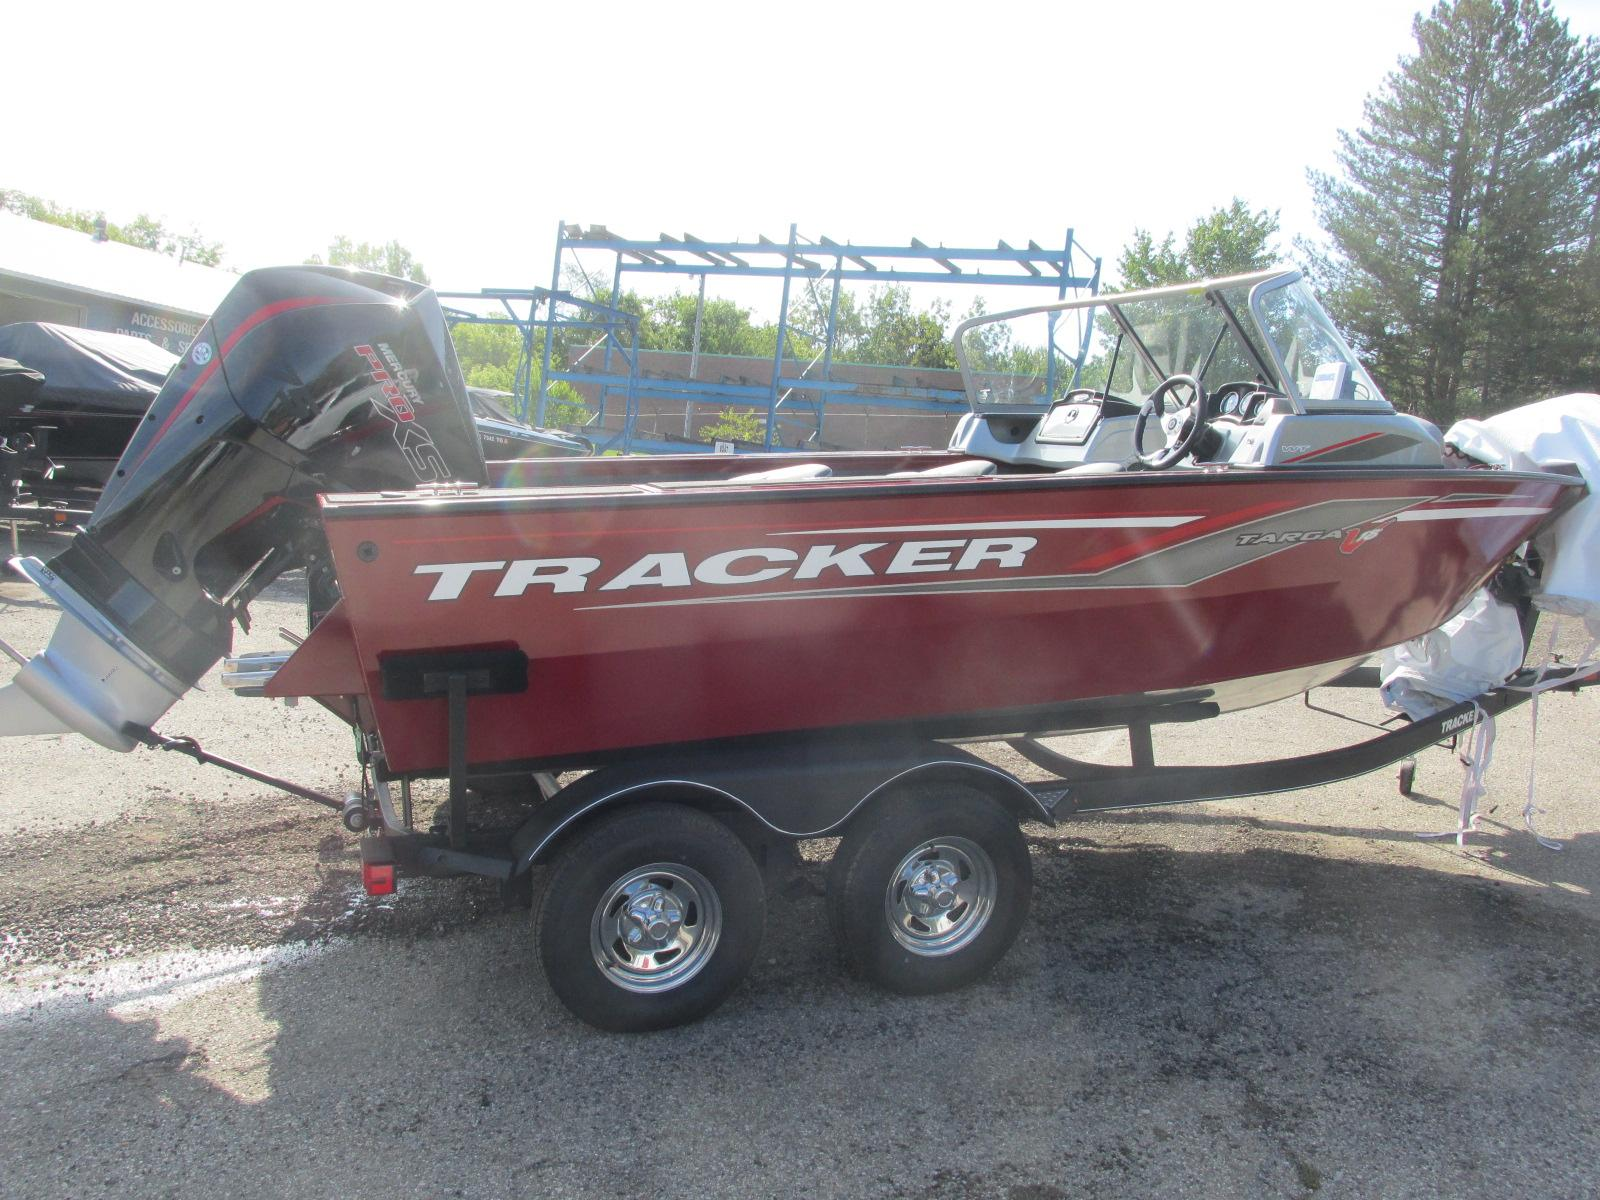 TrackerTarga V-18 WT